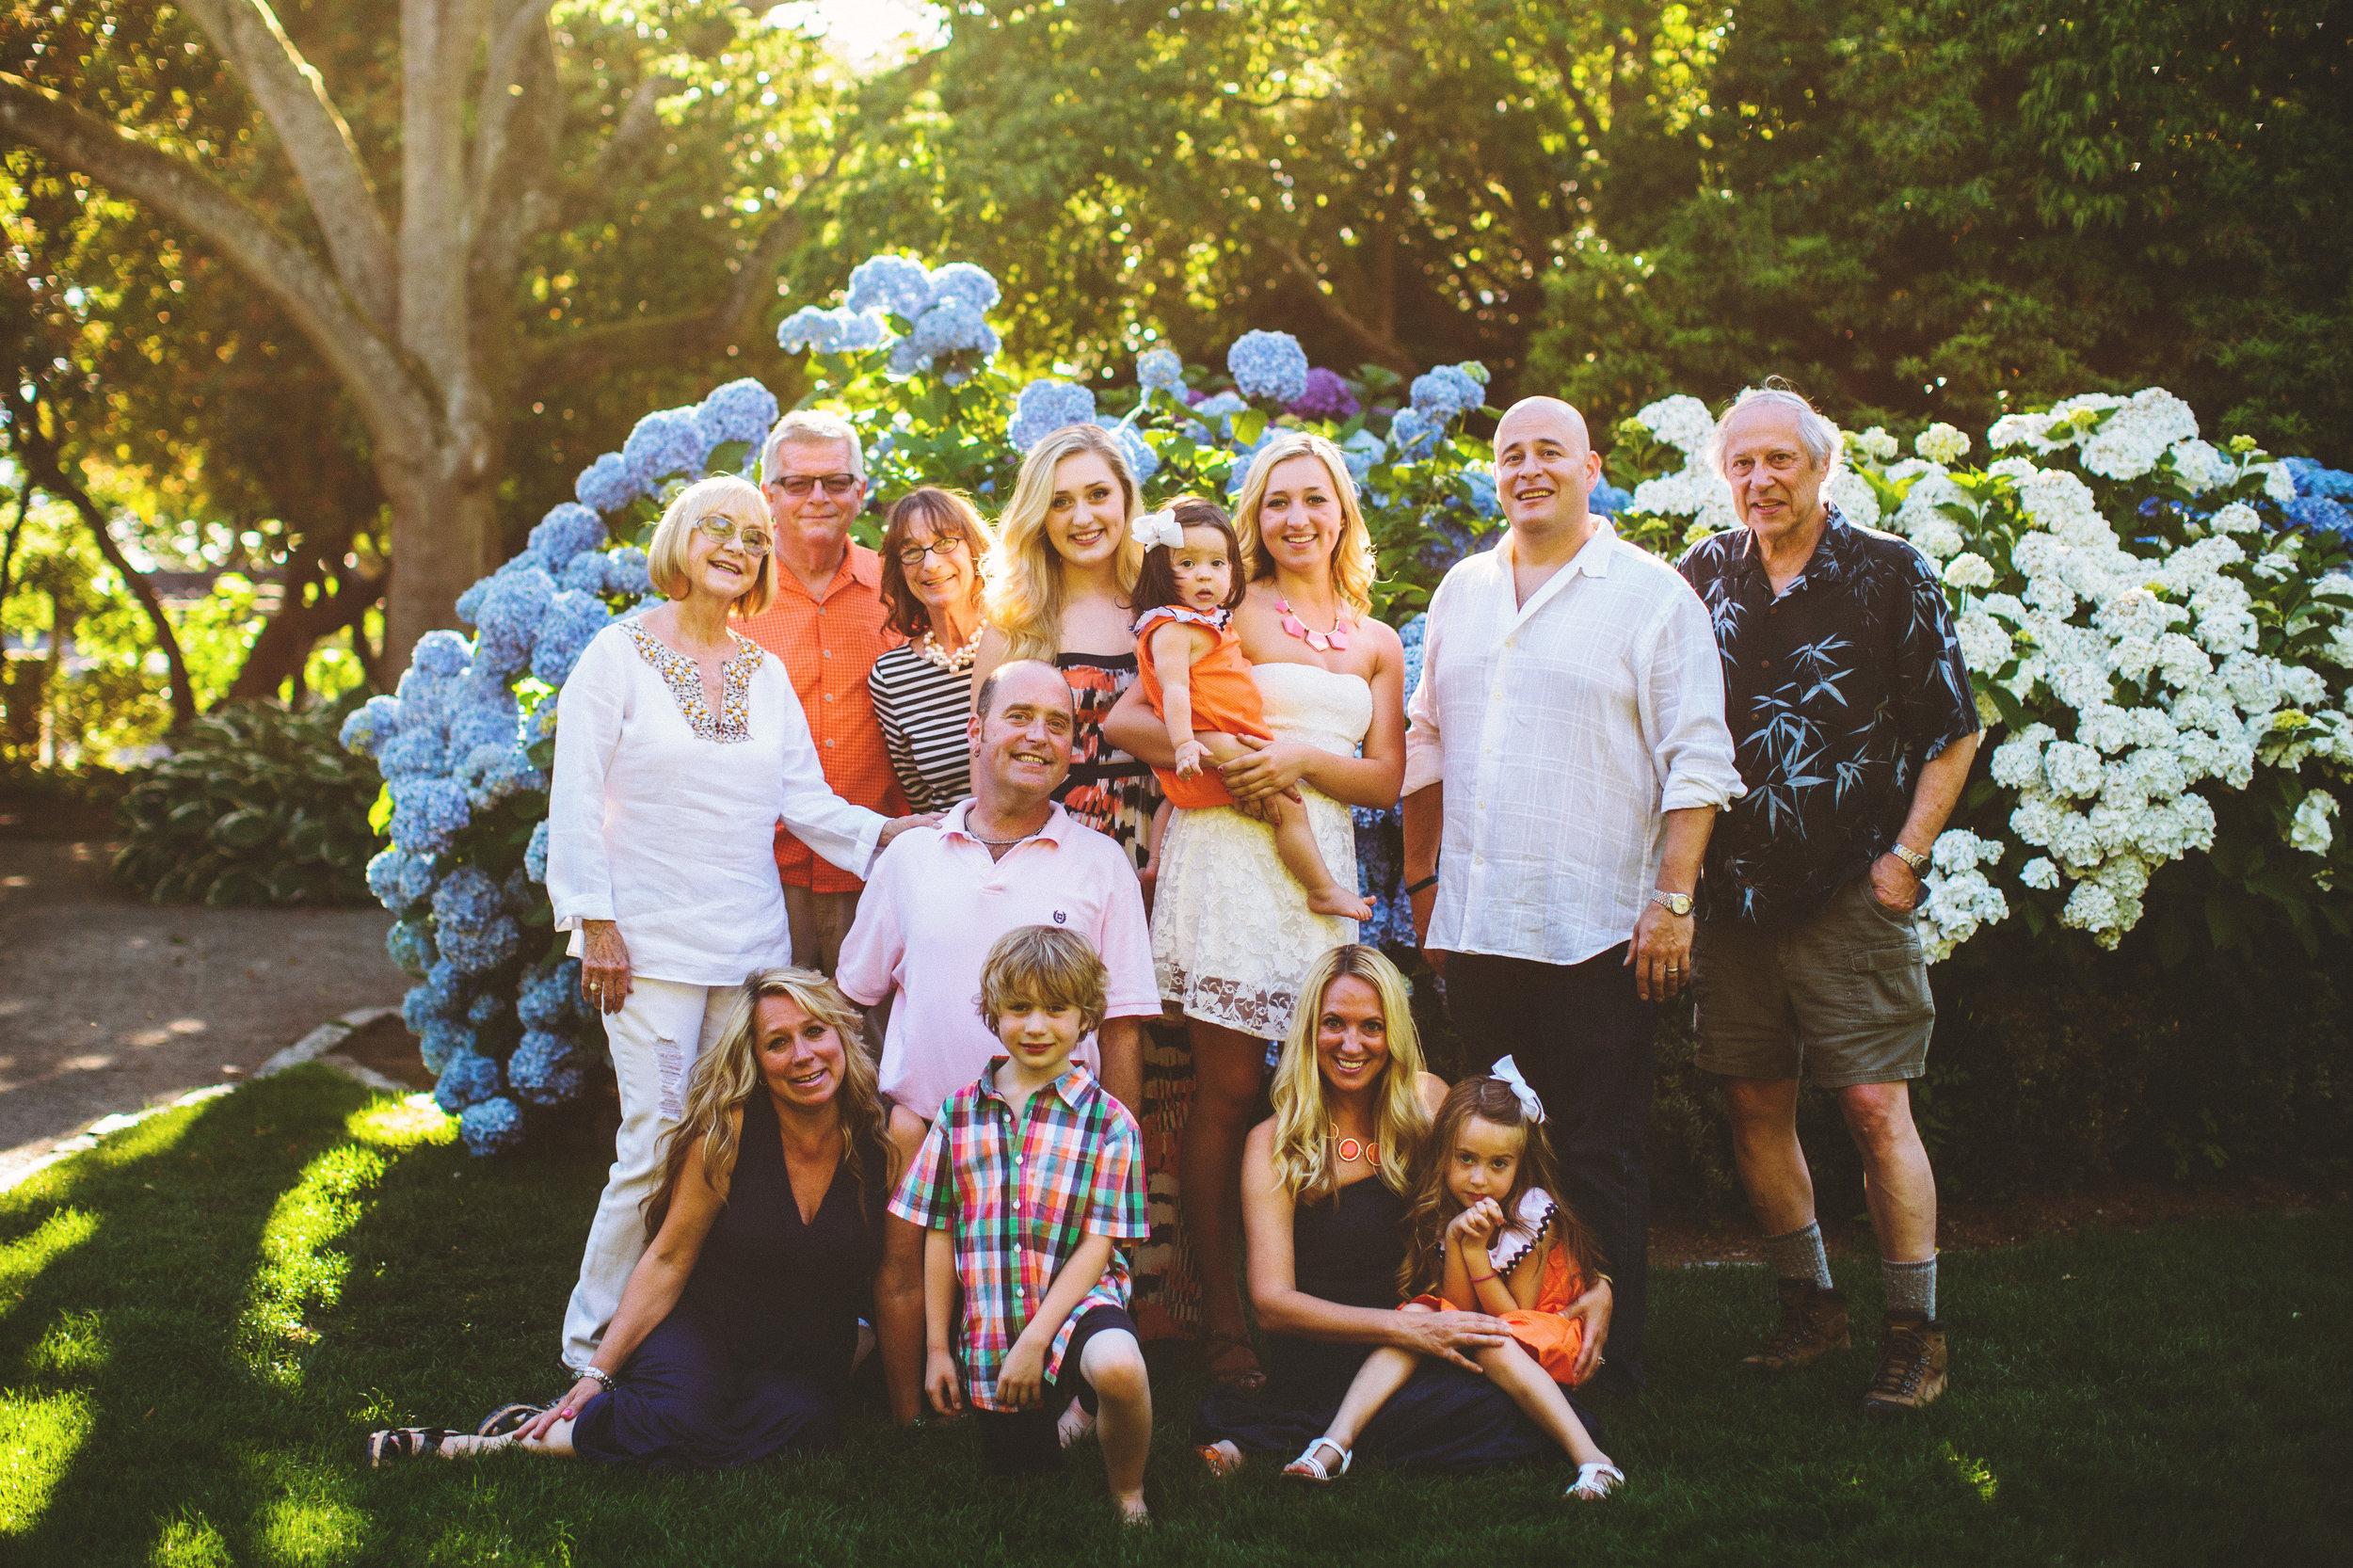 Kori's family